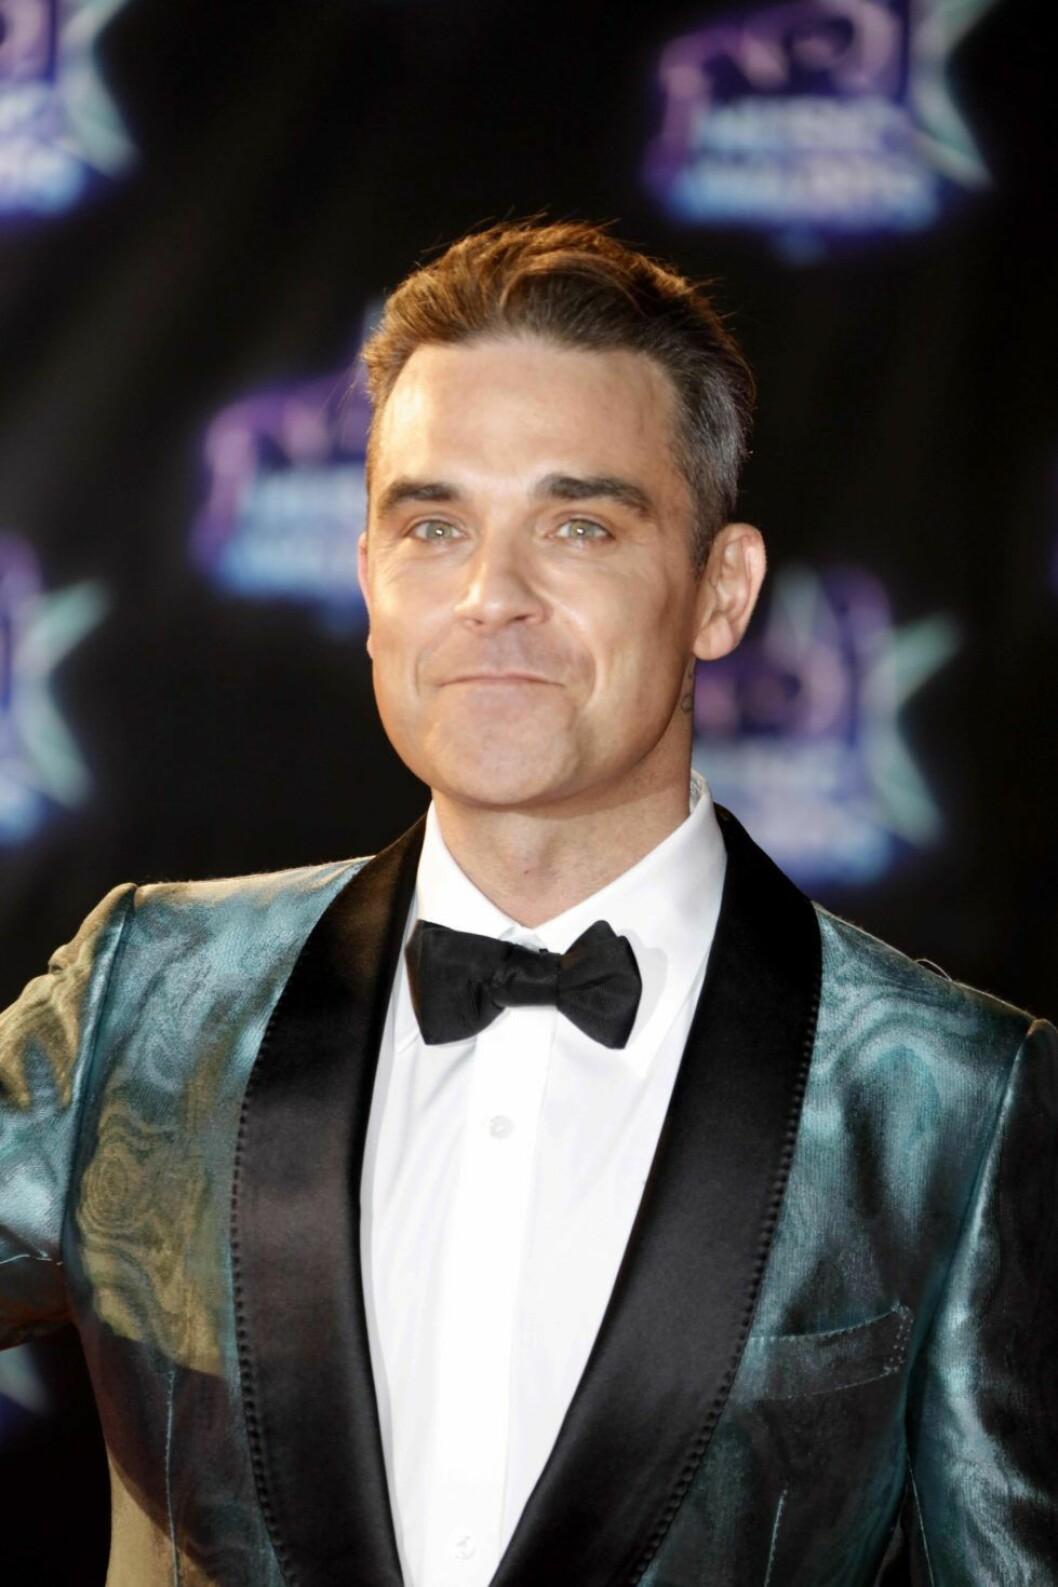 November 13, 2016 - Cannes, France - Robbie Williams - 18ème NRJ Music Awards au Palais des Festivals à Cannes, France, le 12 Novembre 2016. # SOIREE 'NRJ MUSIC AWARDS 2016' AU PALAIS DES FESTIVALS A CANNES (Credit Image: © Visual via ZUMA Press) (c) Zumapress / IBL